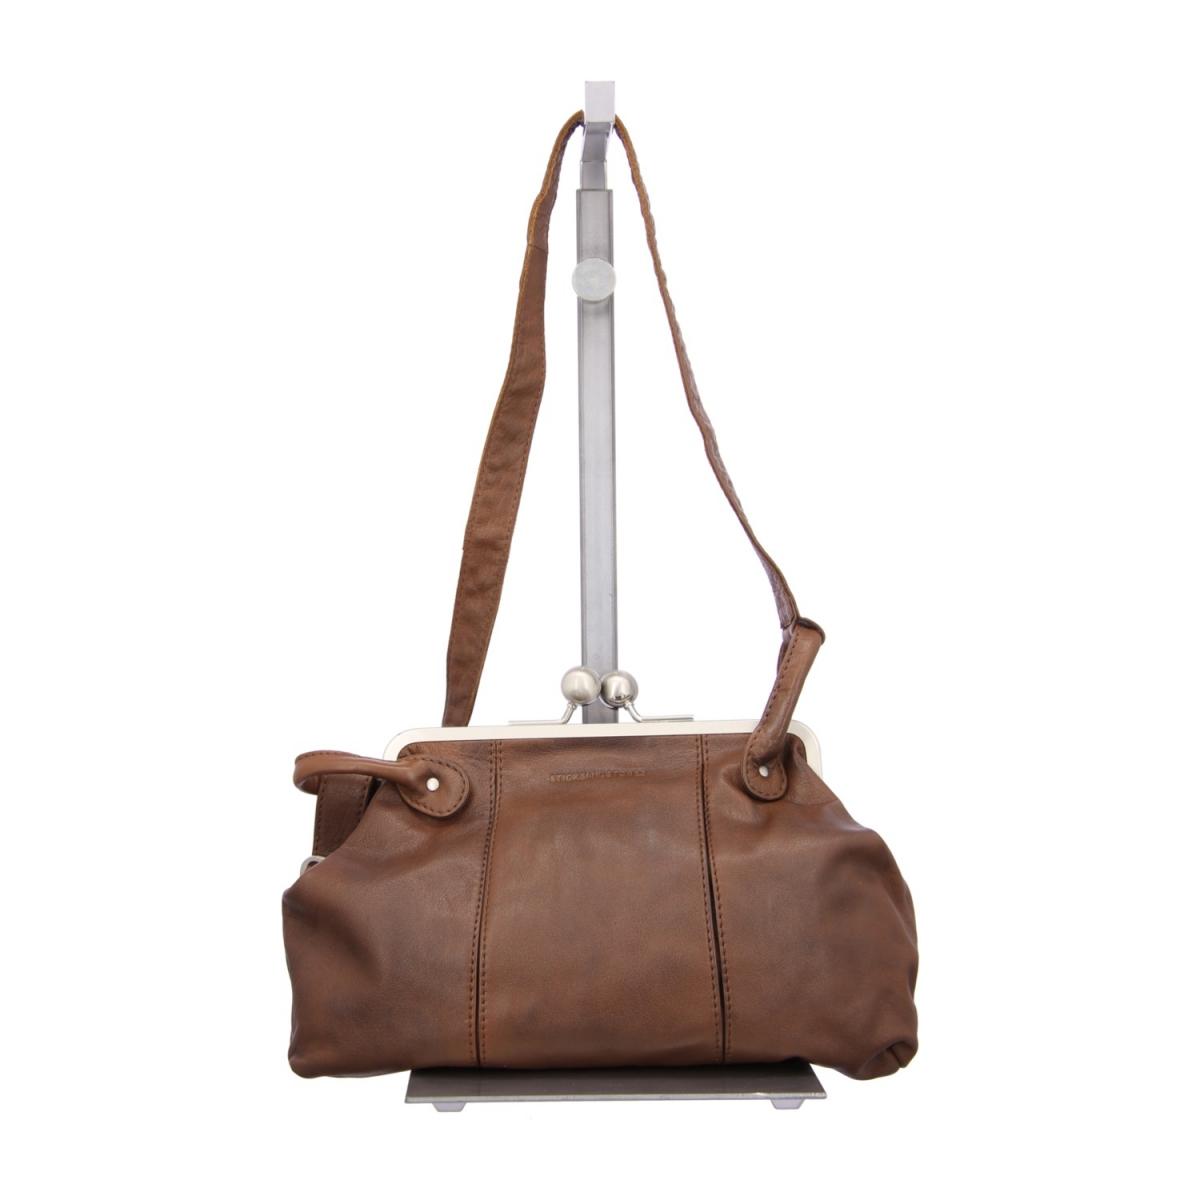 sticks and stones toulouse bag handtasche braun. Black Bedroom Furniture Sets. Home Design Ideas